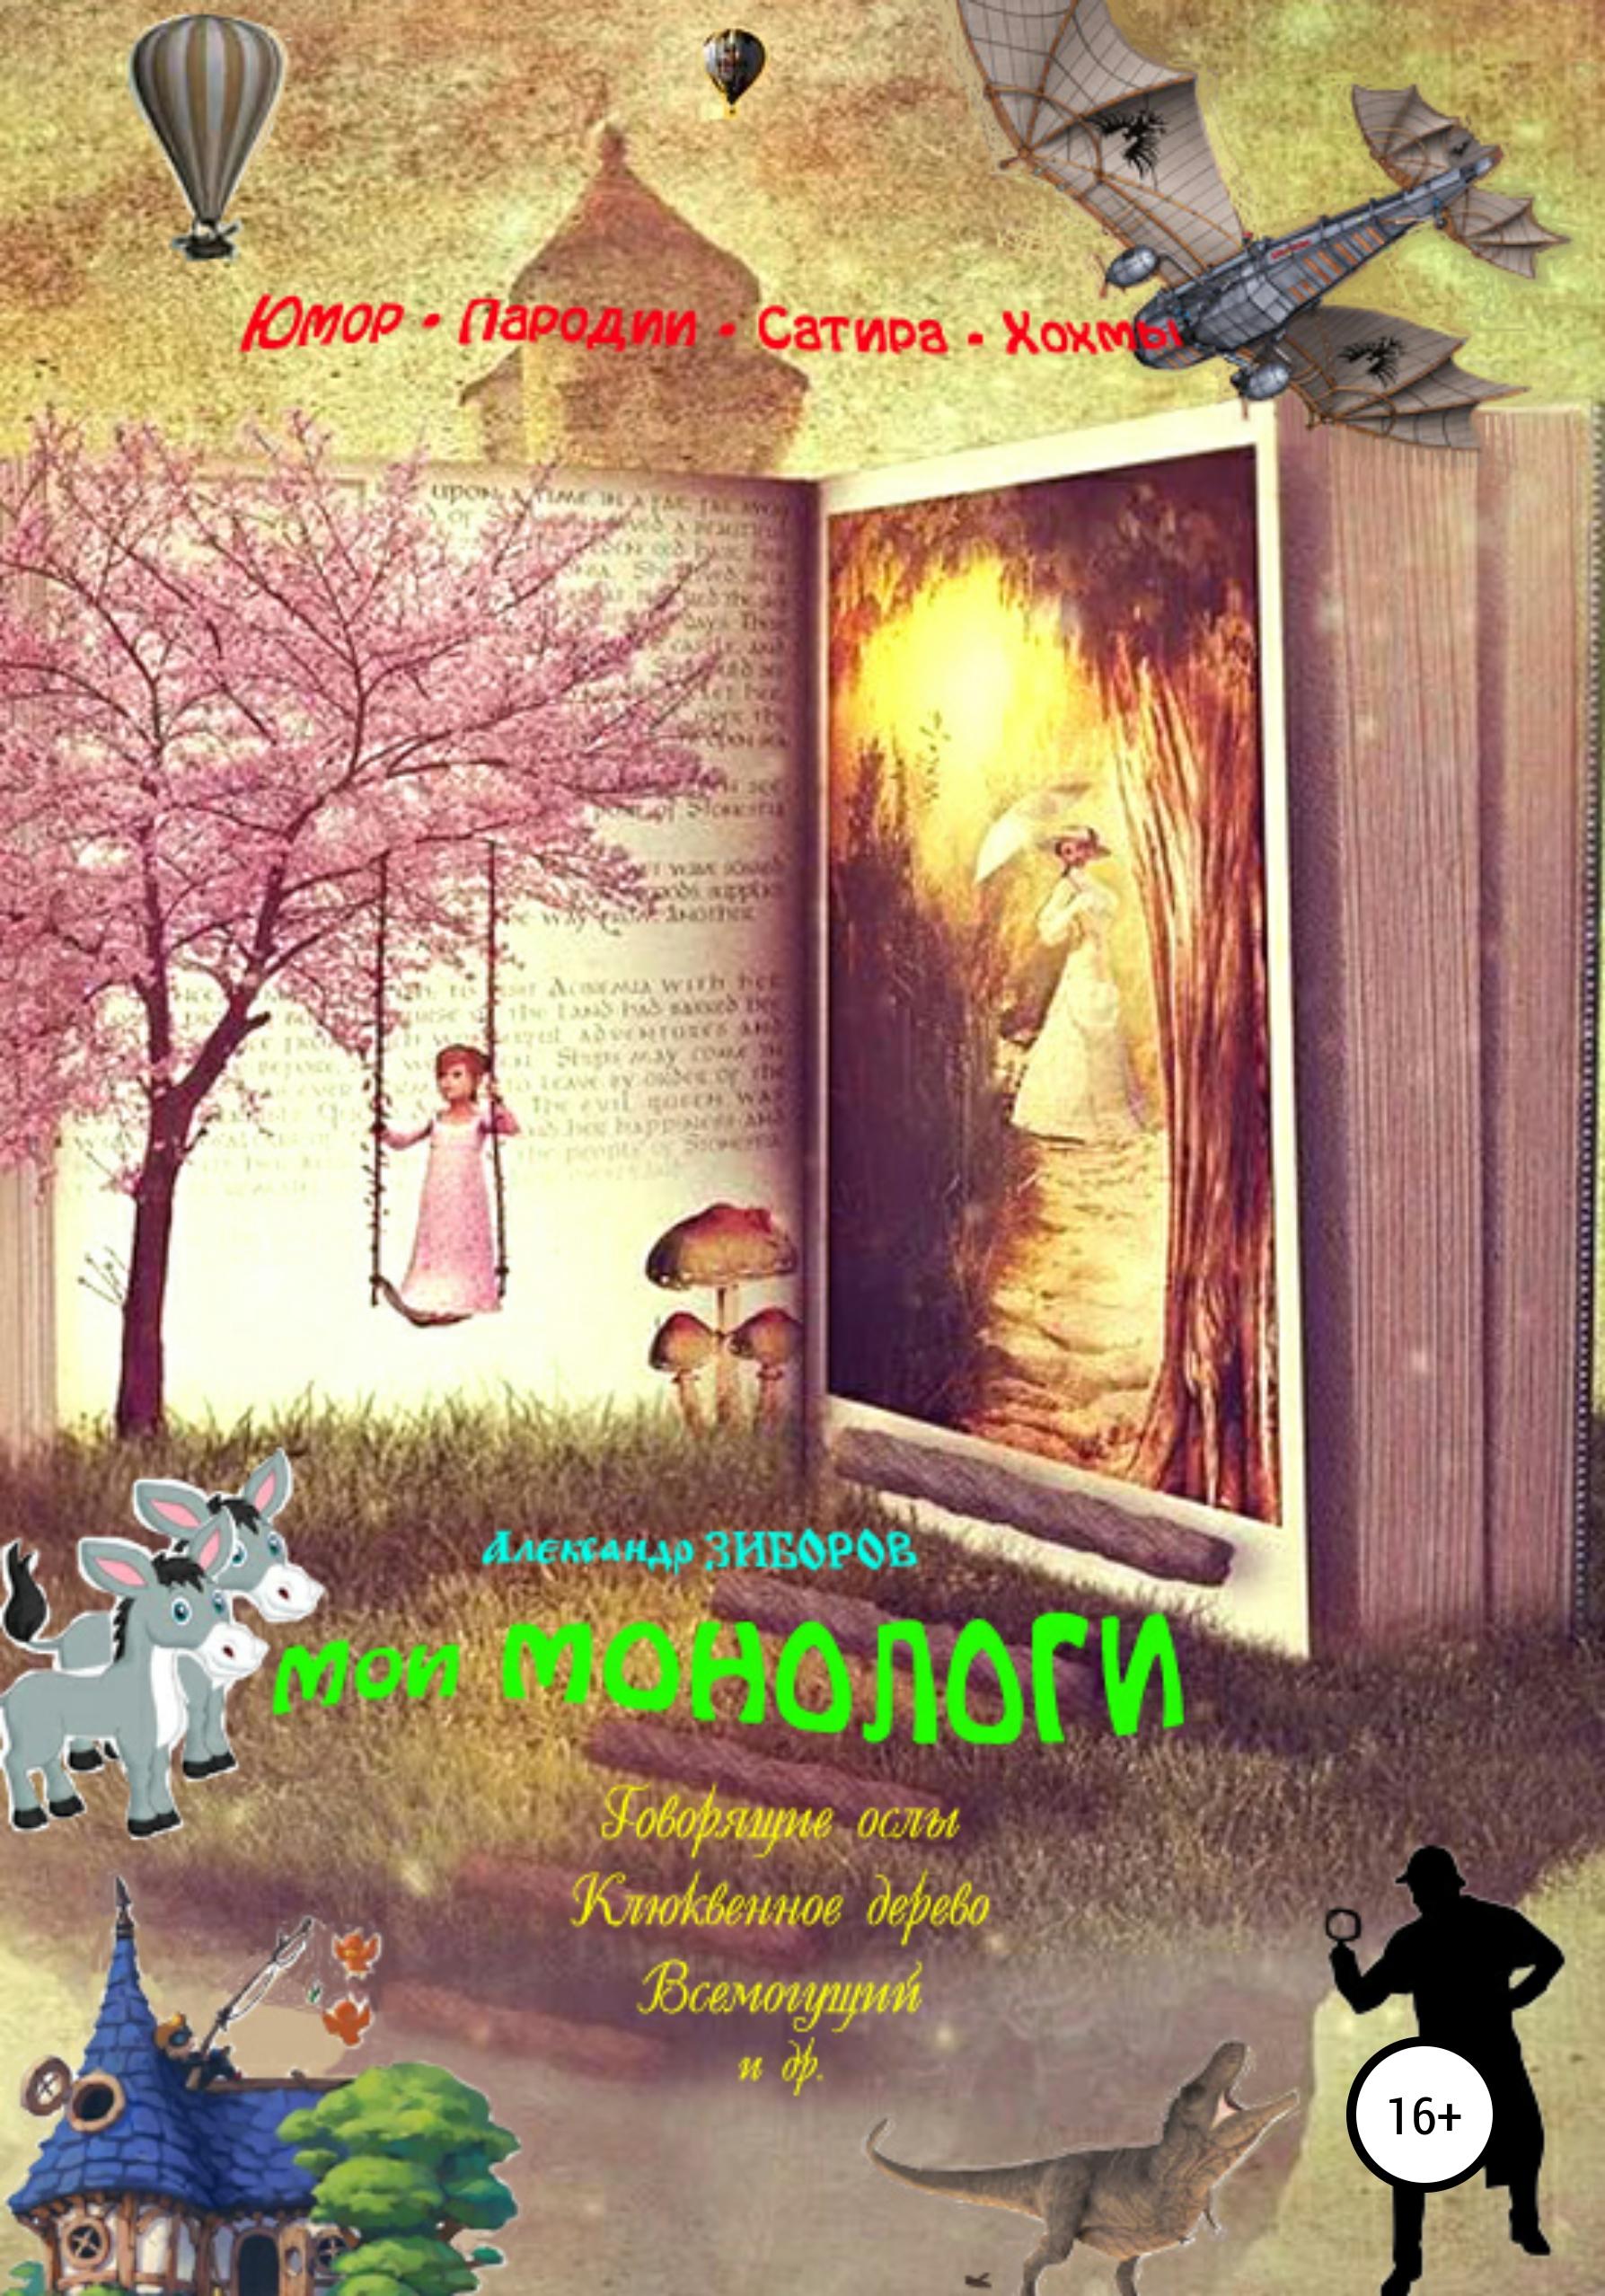 Александр Зиборов Мои монологи антология сатиры и юмора россии хх века том 41 эпиграмма